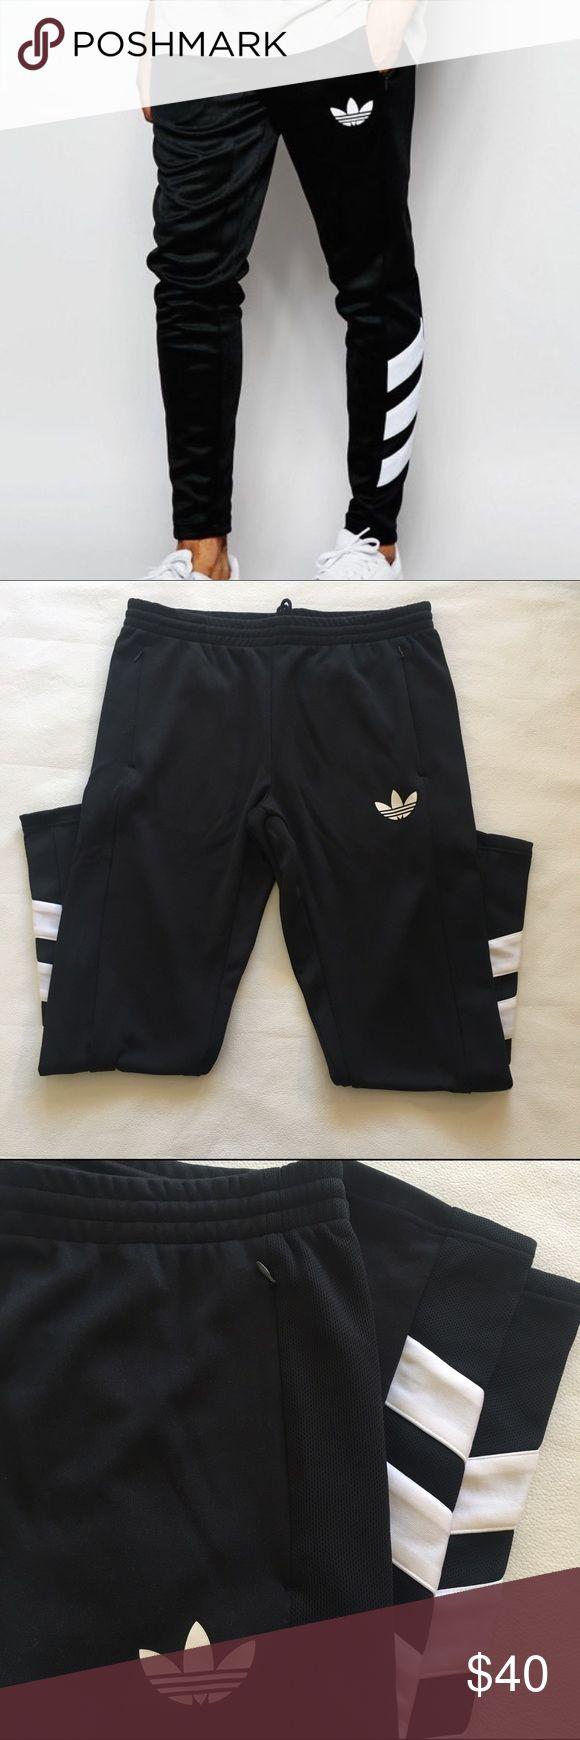 Men's Adidas Logo Trackpants Super cool  Adidas originals men's track pants with on trend slim leg fit. Machine washable. Excellent condition, never worn! Adidas Pants Sweatpants & Joggers